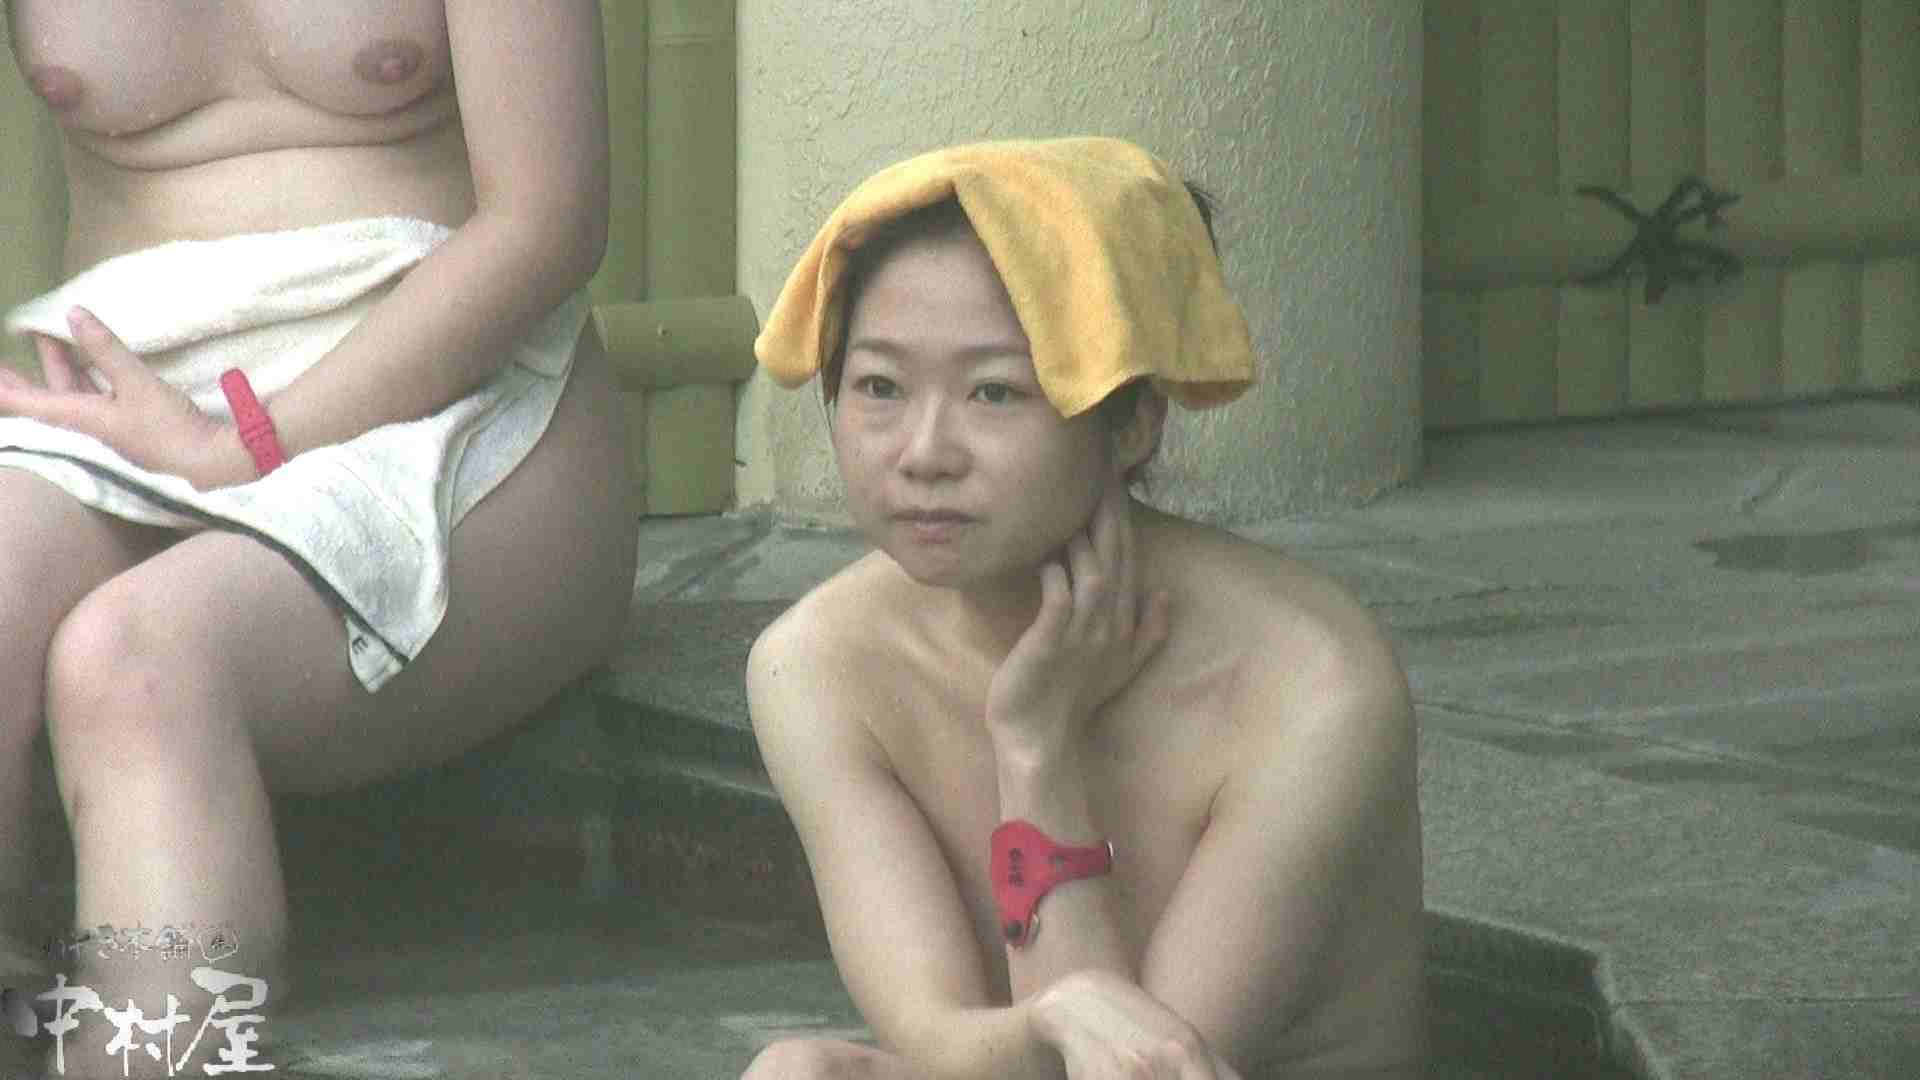 Aquaな露天風呂Vol.912 0  90連発 36